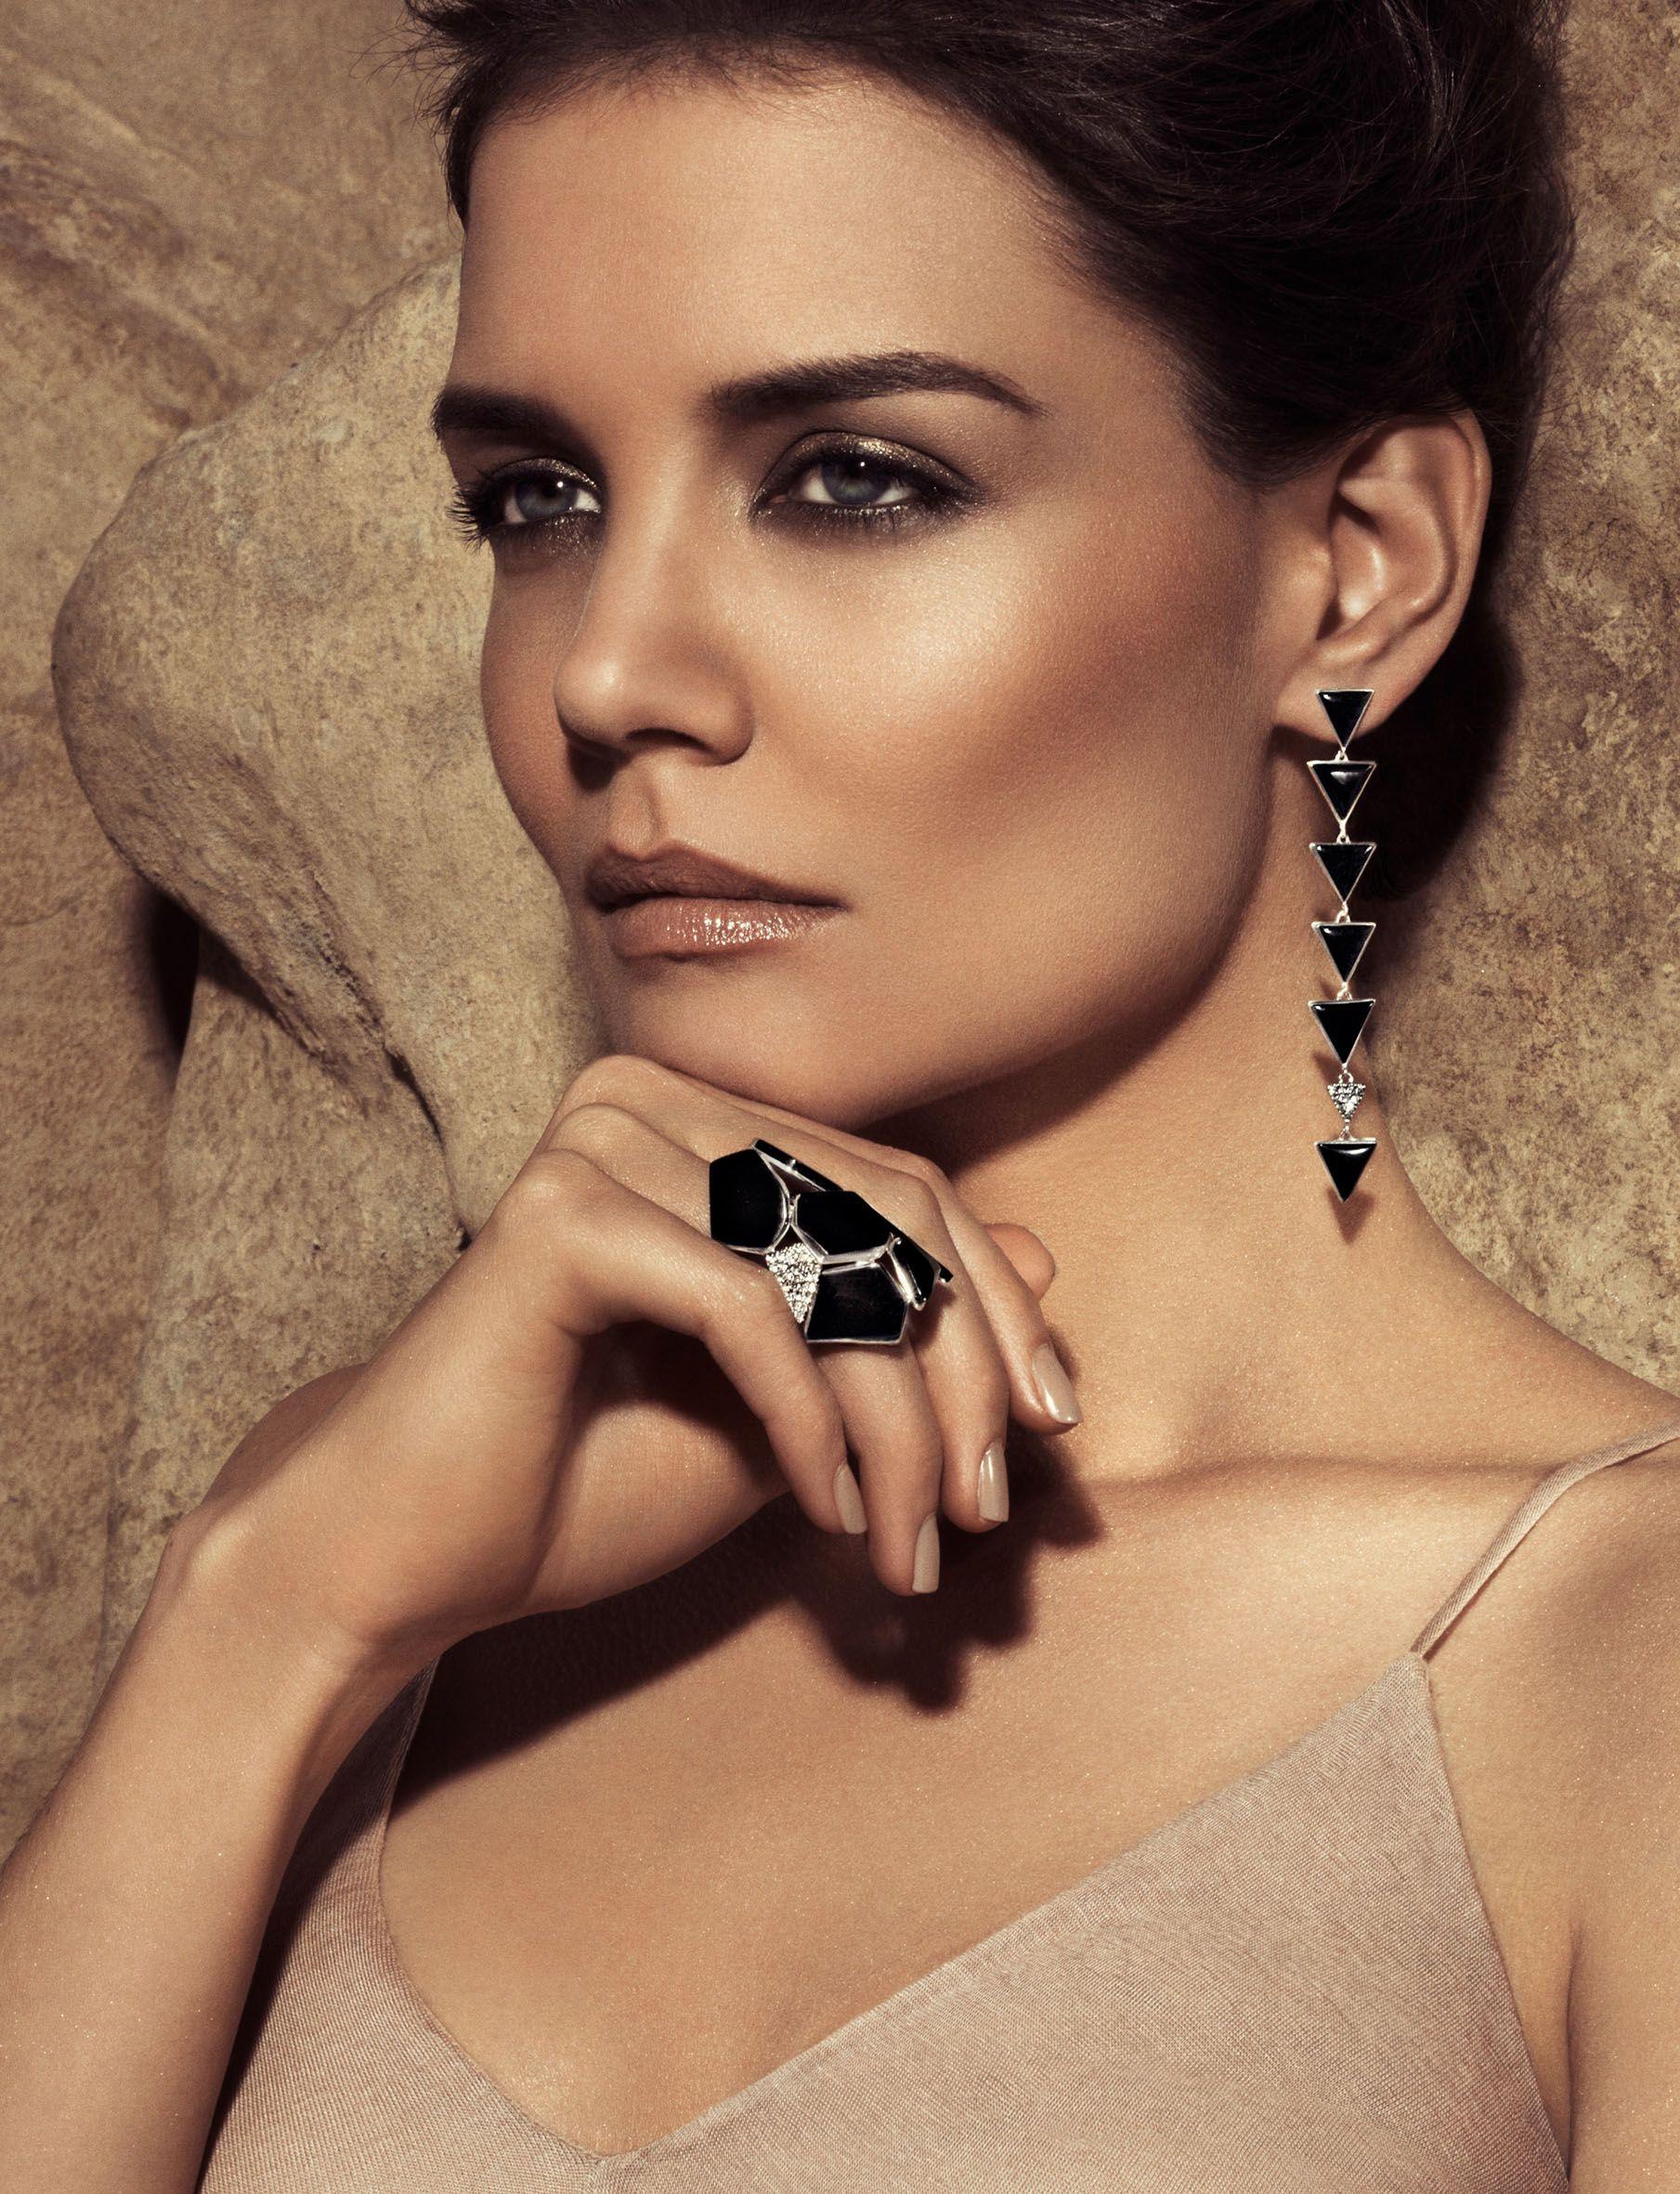 h stern 2011 katie holmes fashion ads 2011 pinterest bijoux portant bijoux et glamour. Black Bedroom Furniture Sets. Home Design Ideas